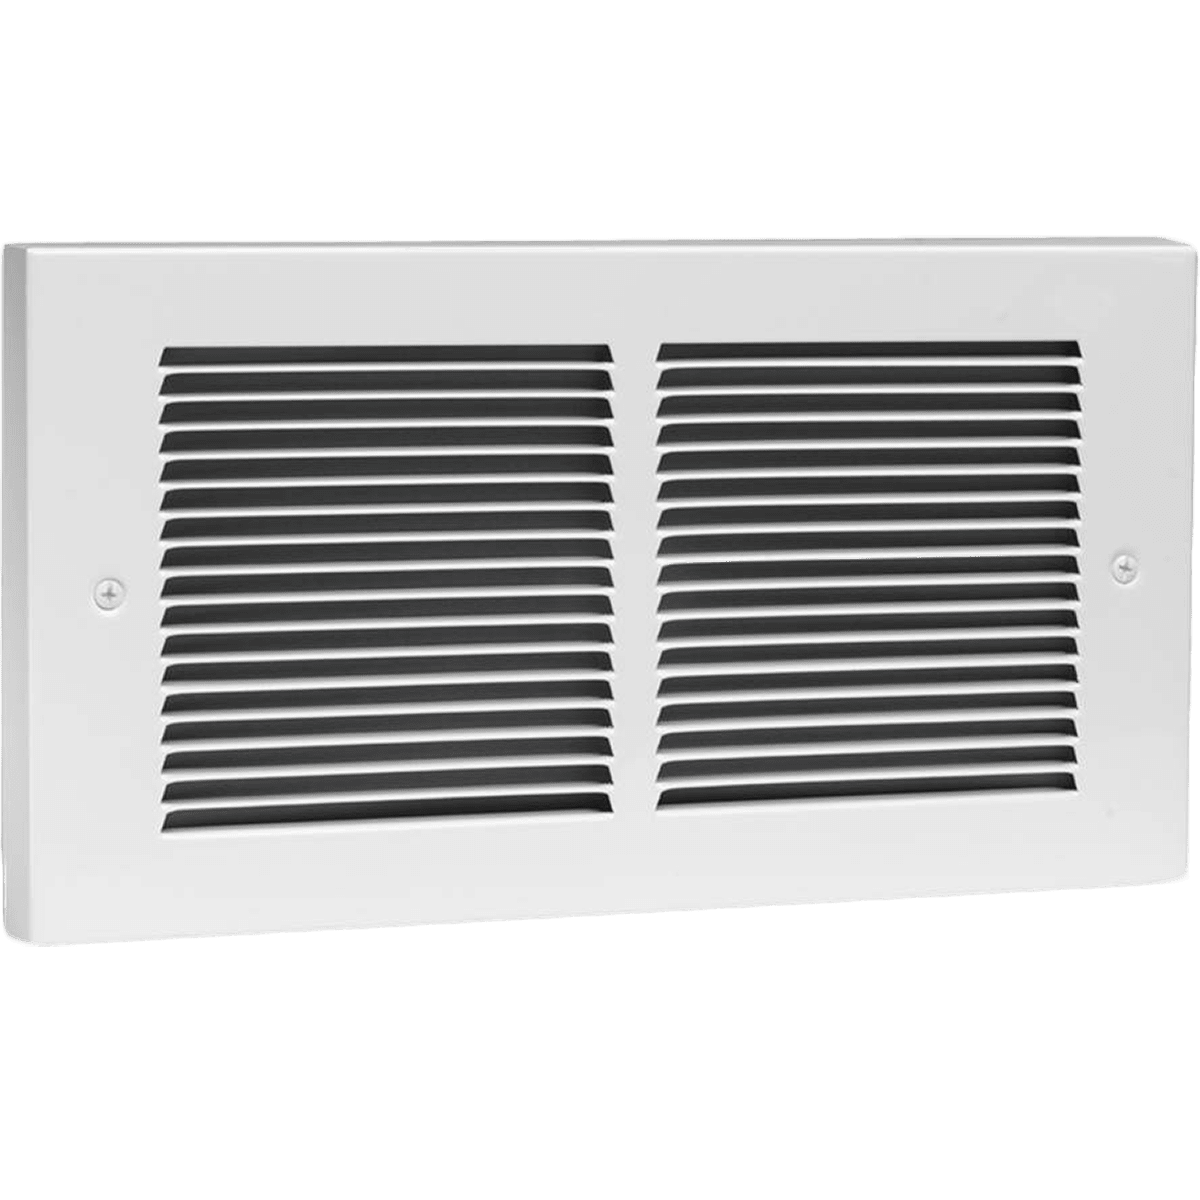 cadet register rmc202w wall heater angle main cadet rmc202w register plus 2000 watt wall heater sylvane